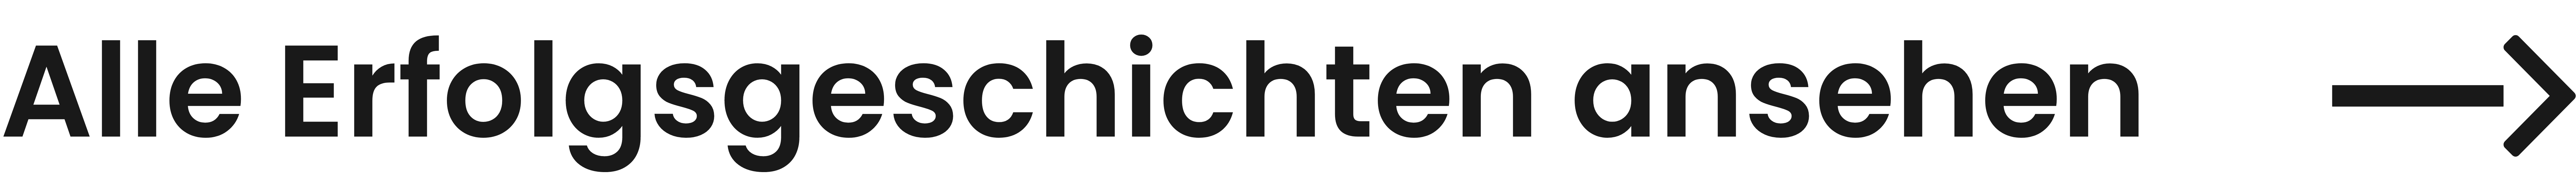 link-bild-erfolgsgeschichten-online-beratung-software-bridge-its-gmbh